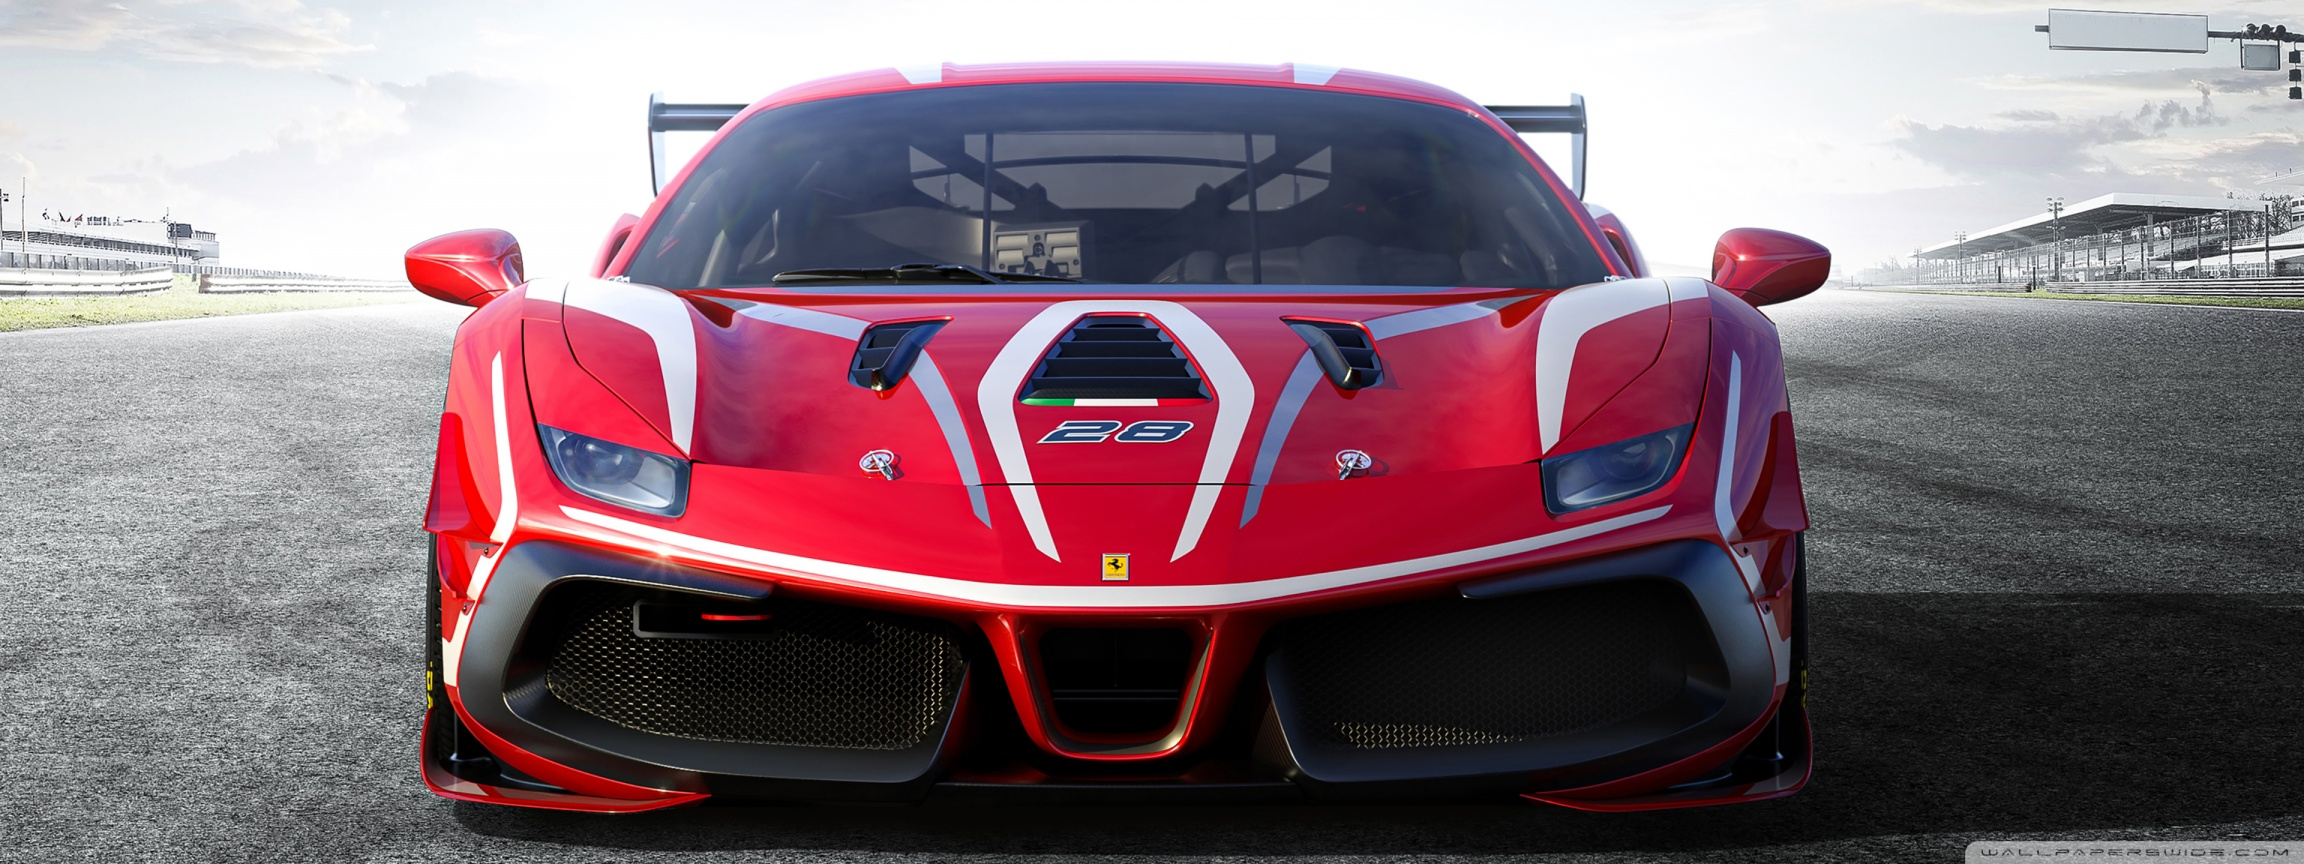 Ferrari 488 Challenge Evo Race Car 2020 Ultra HD Desktop 2304x864